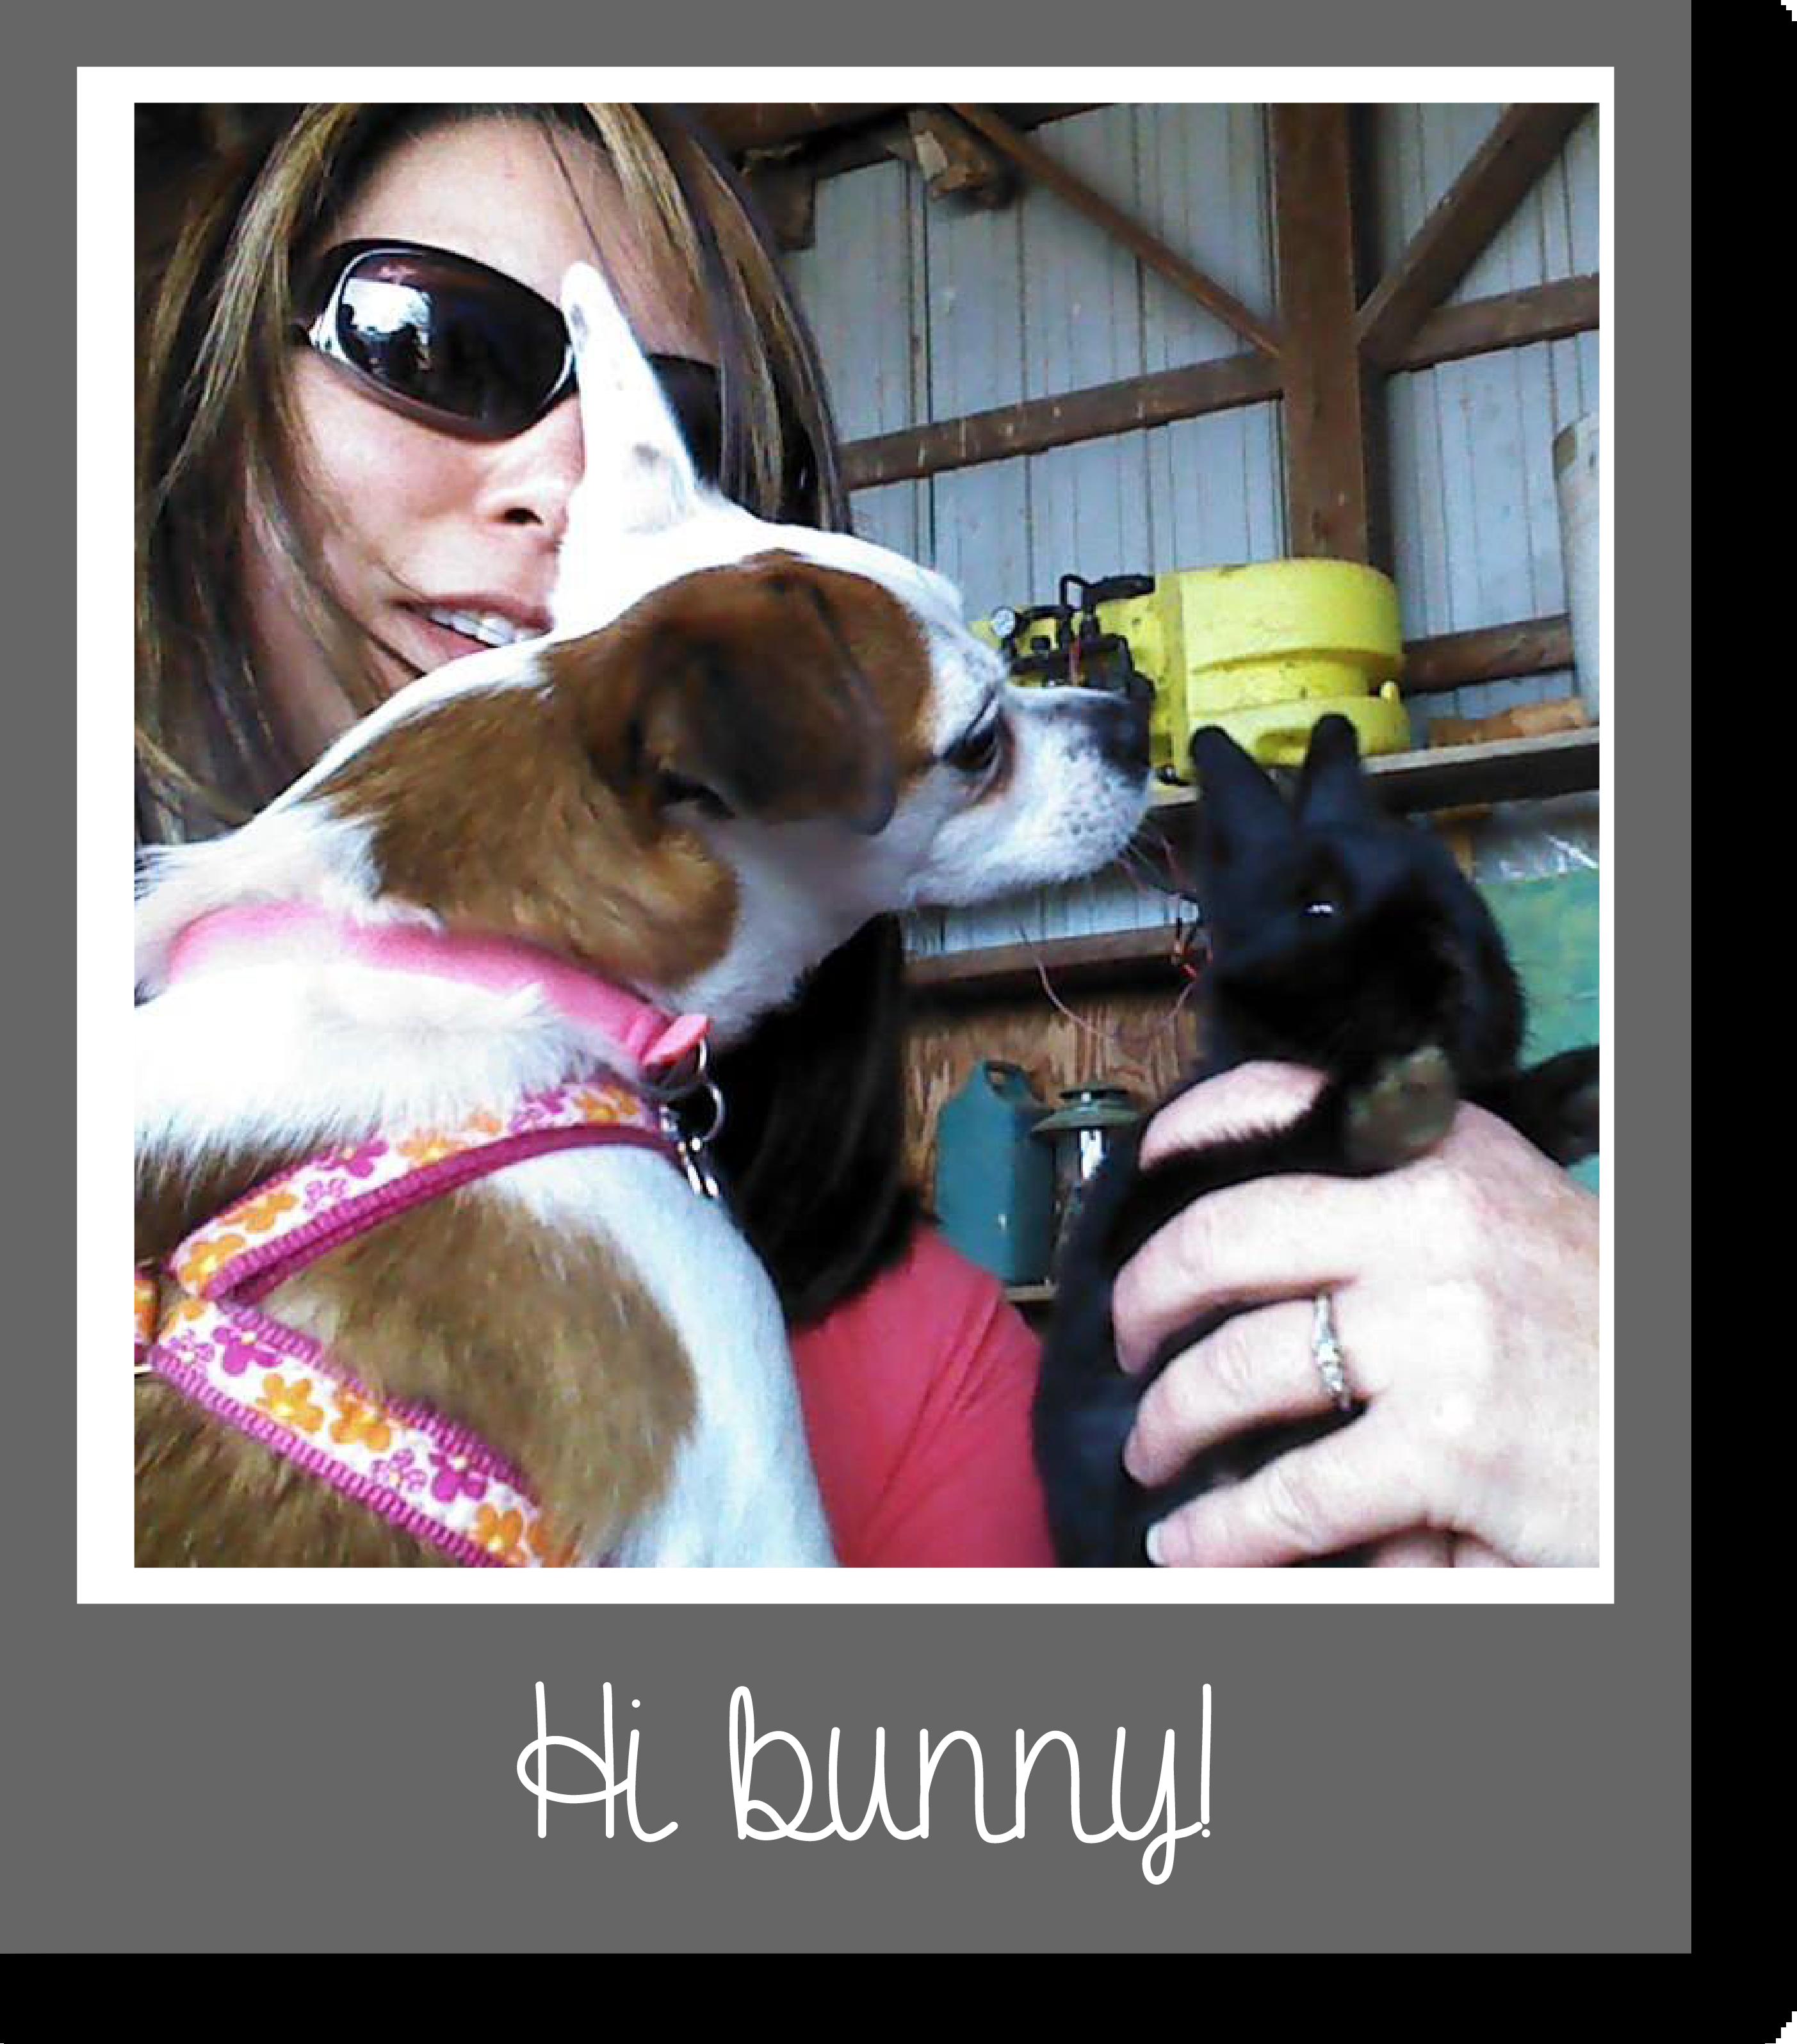 Tilly's Travels - Hi bunny!